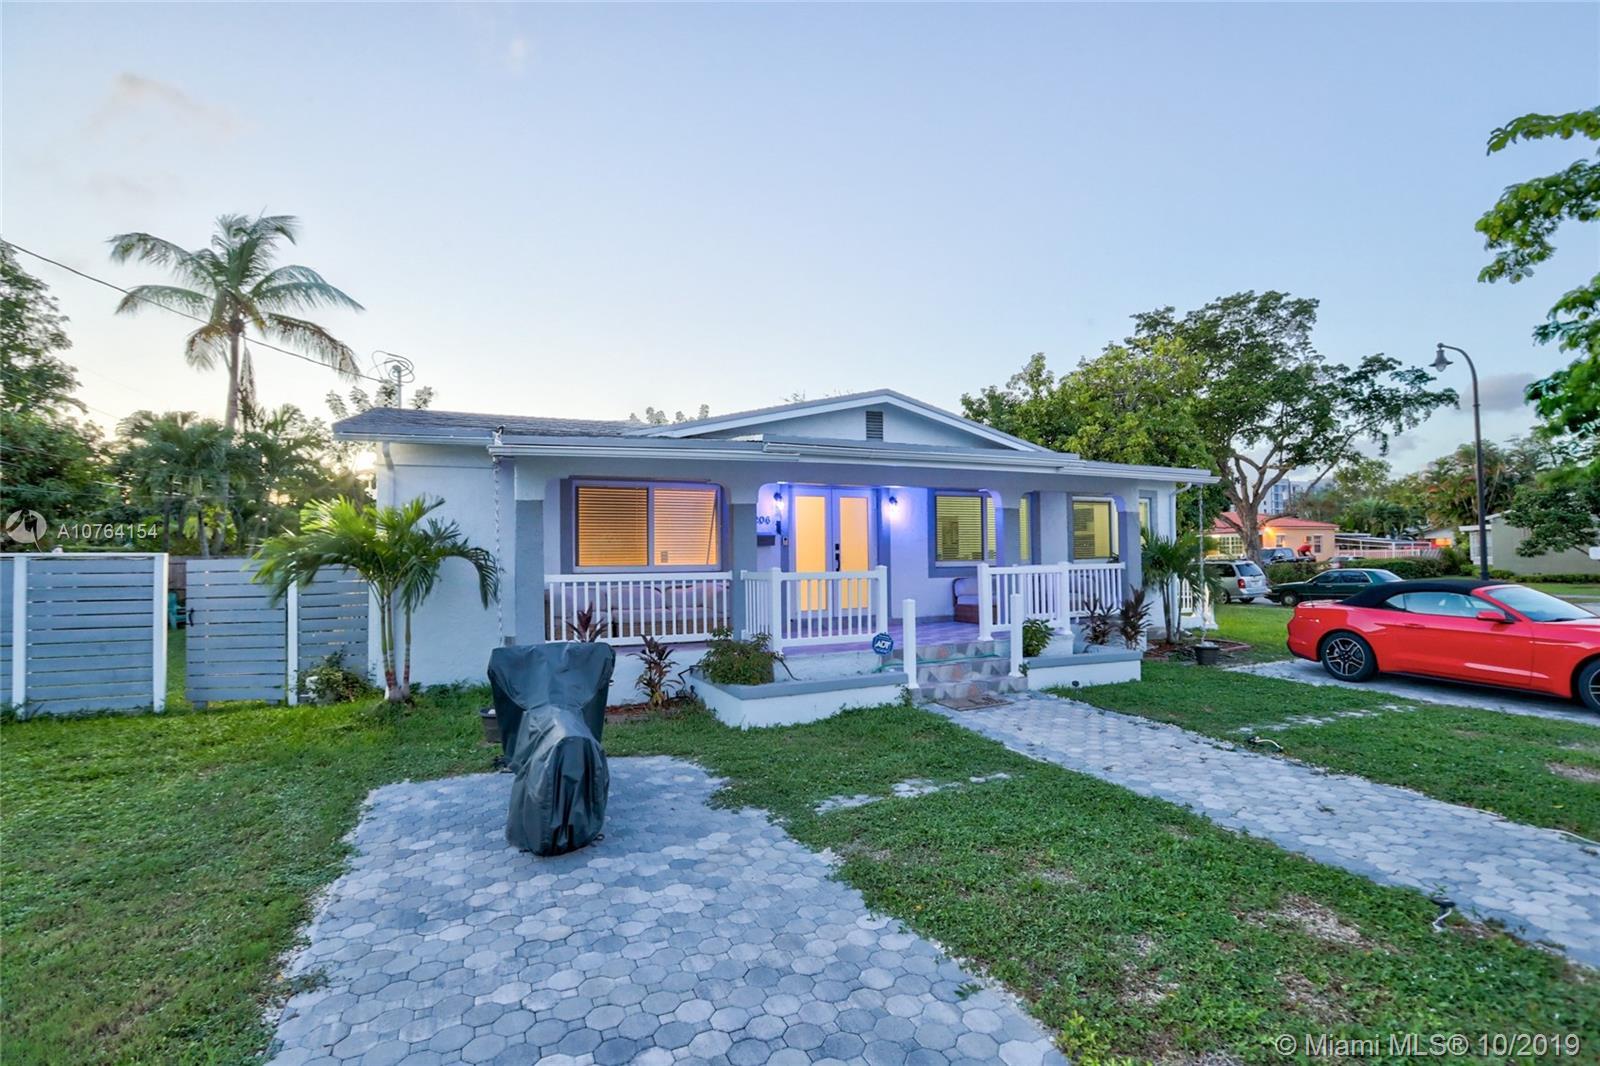 6206 SW 10th Ter, West Miami, FL 33144 - West Miami, FL real estate listing